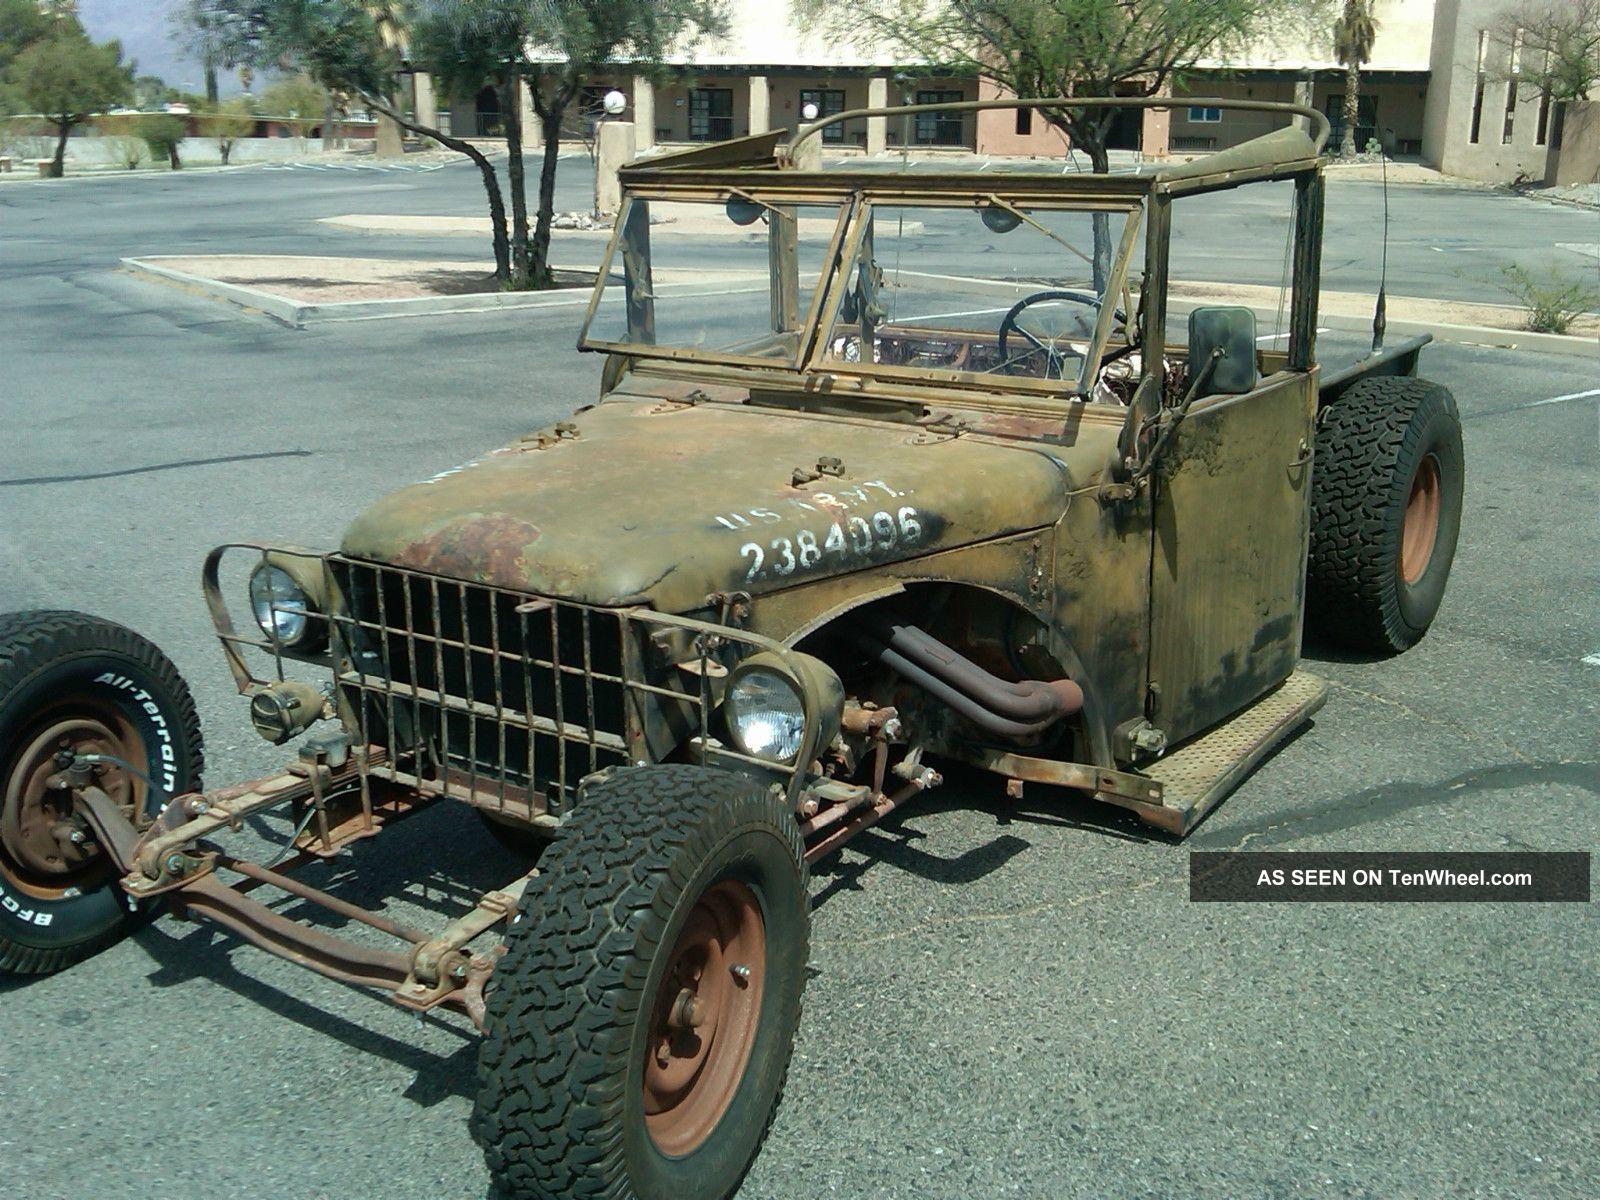 1952 M37 Dodge Power Wagon Military Rat Rod Truck Ratrod Hot Rod Hotrod Power Wagon photo